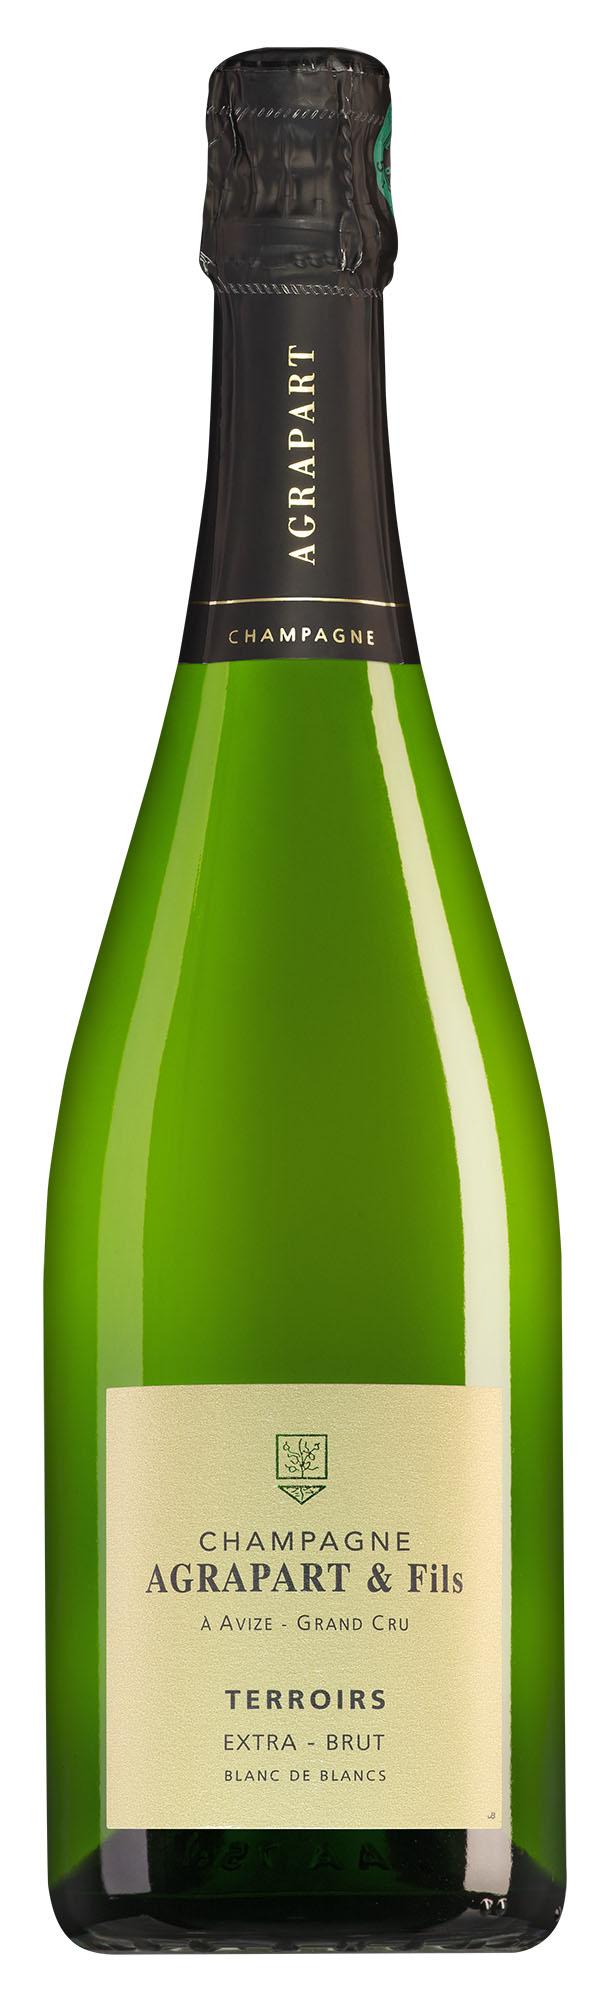 Agrapart Champagne Grand Cru Terroirs Extra Brut